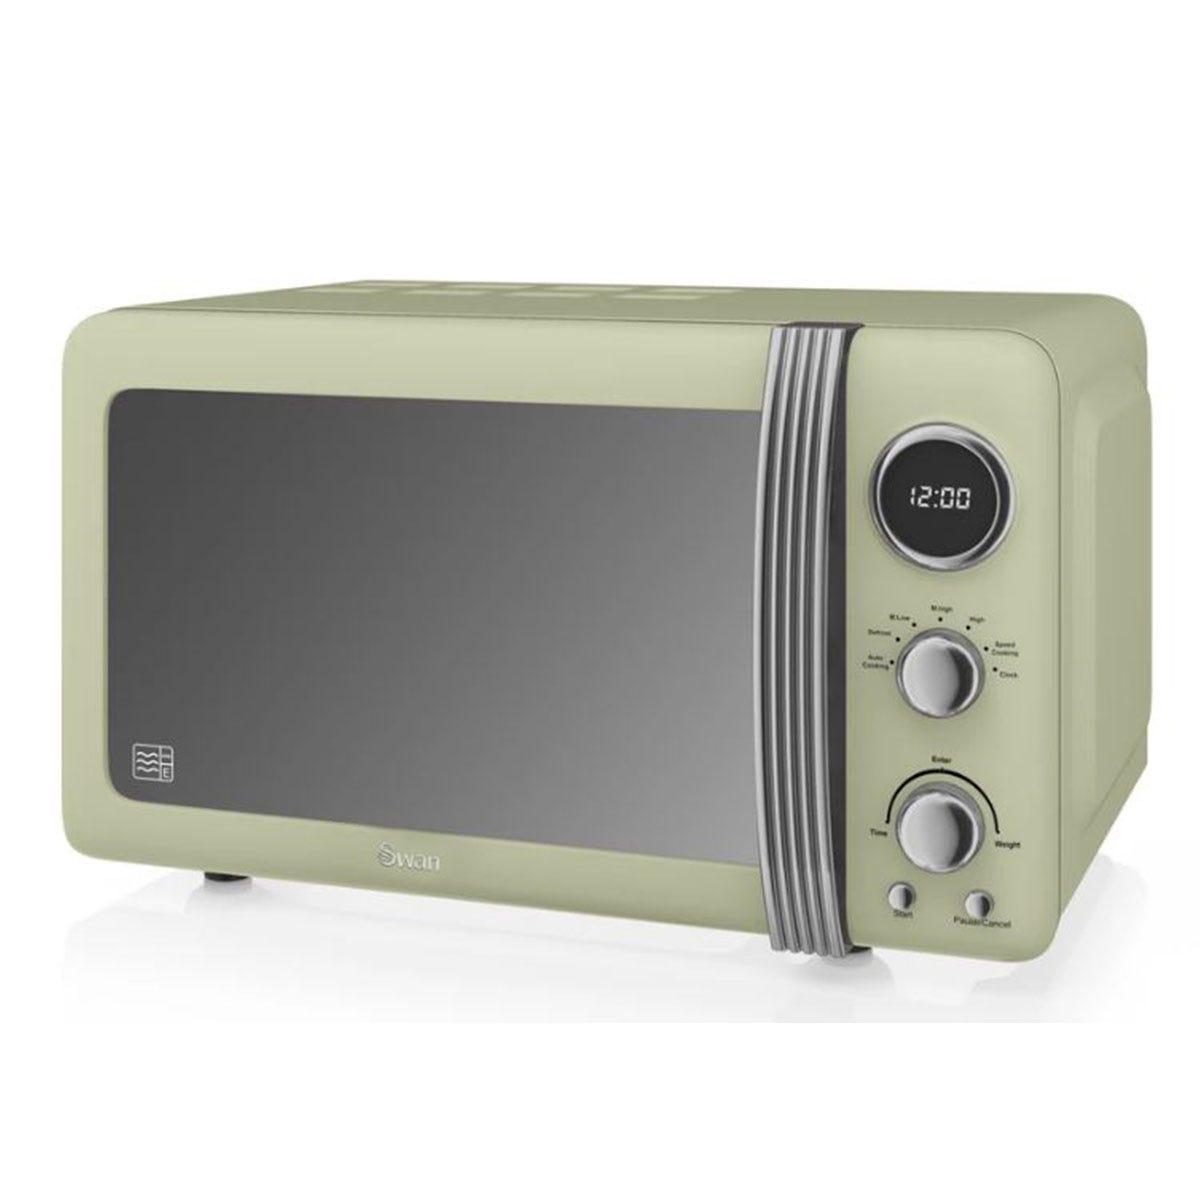 Swan SM22030GN 800W 20L Digital Solo Microwave - Green